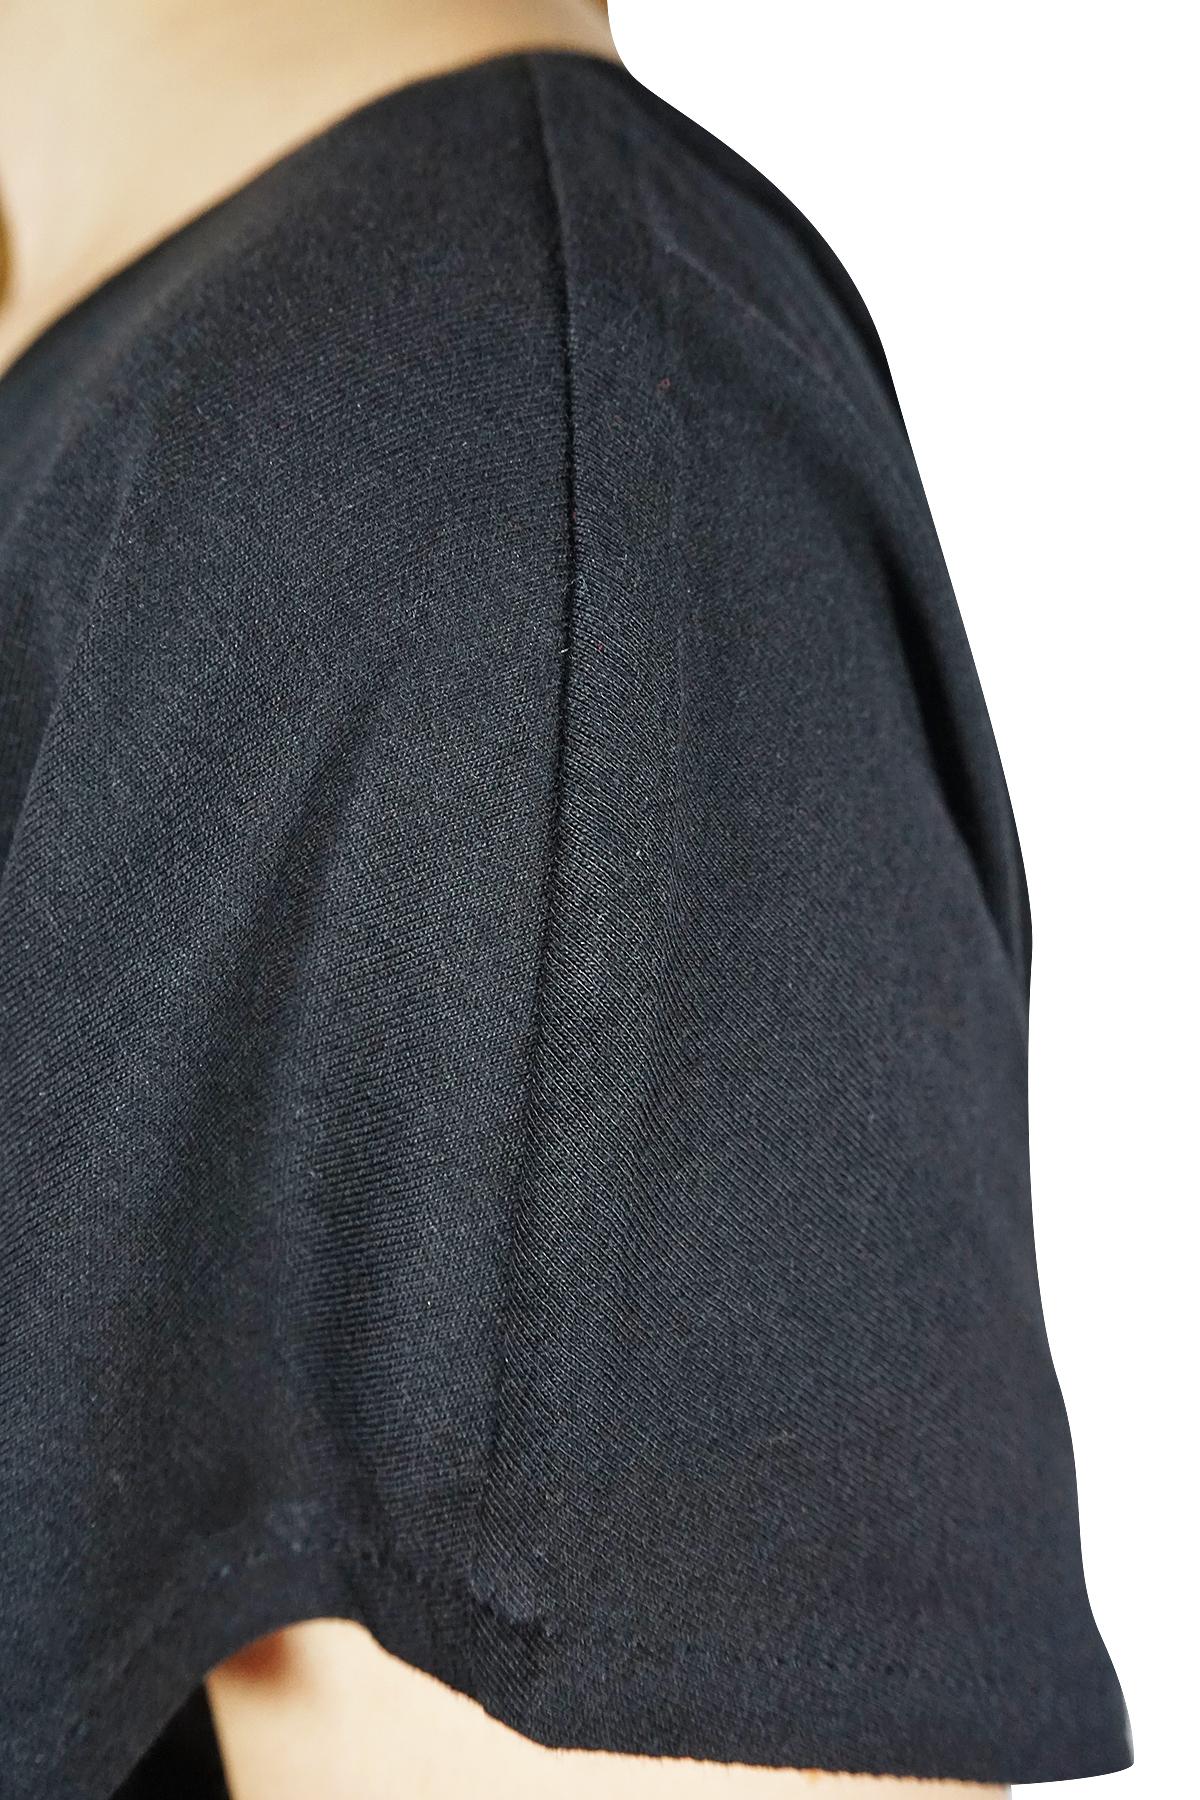 Vero Moda Damen Sommer Kleid kurz mini basic knie lang ...